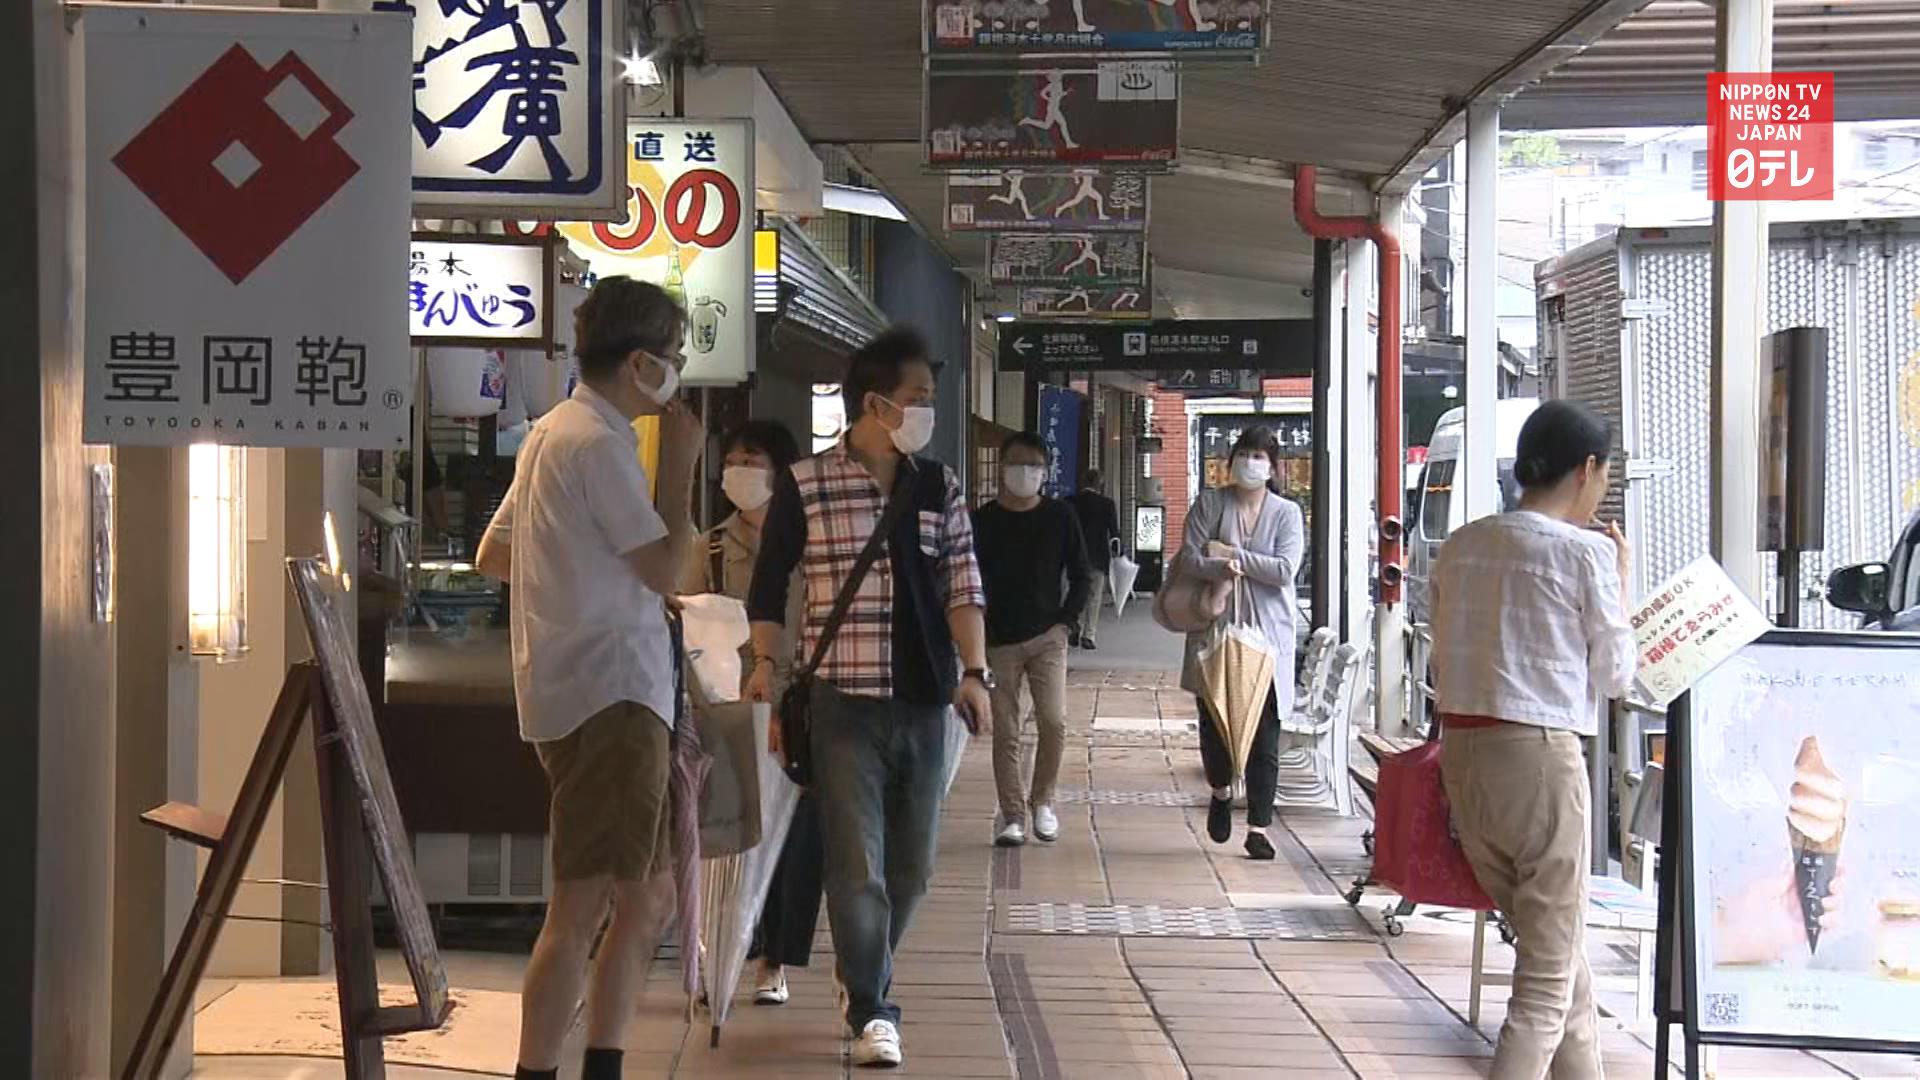 Some visitors back at Japan's tourist destinations